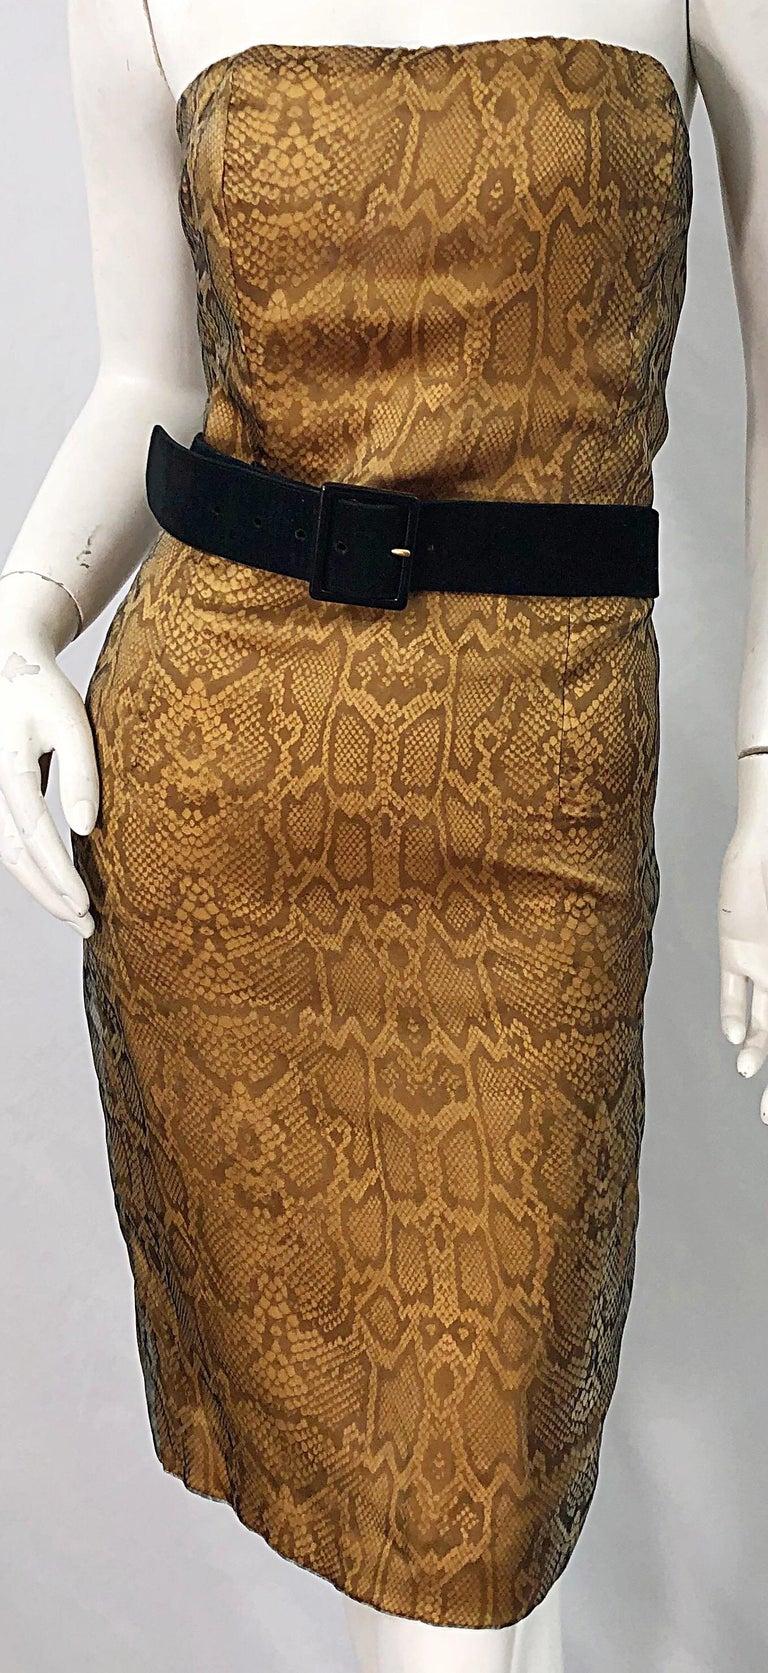 1990s Luca Luca Size 42 / 6 Snakeskin Silk Organza Strapless 90s Tan Brown Dress For Sale 8